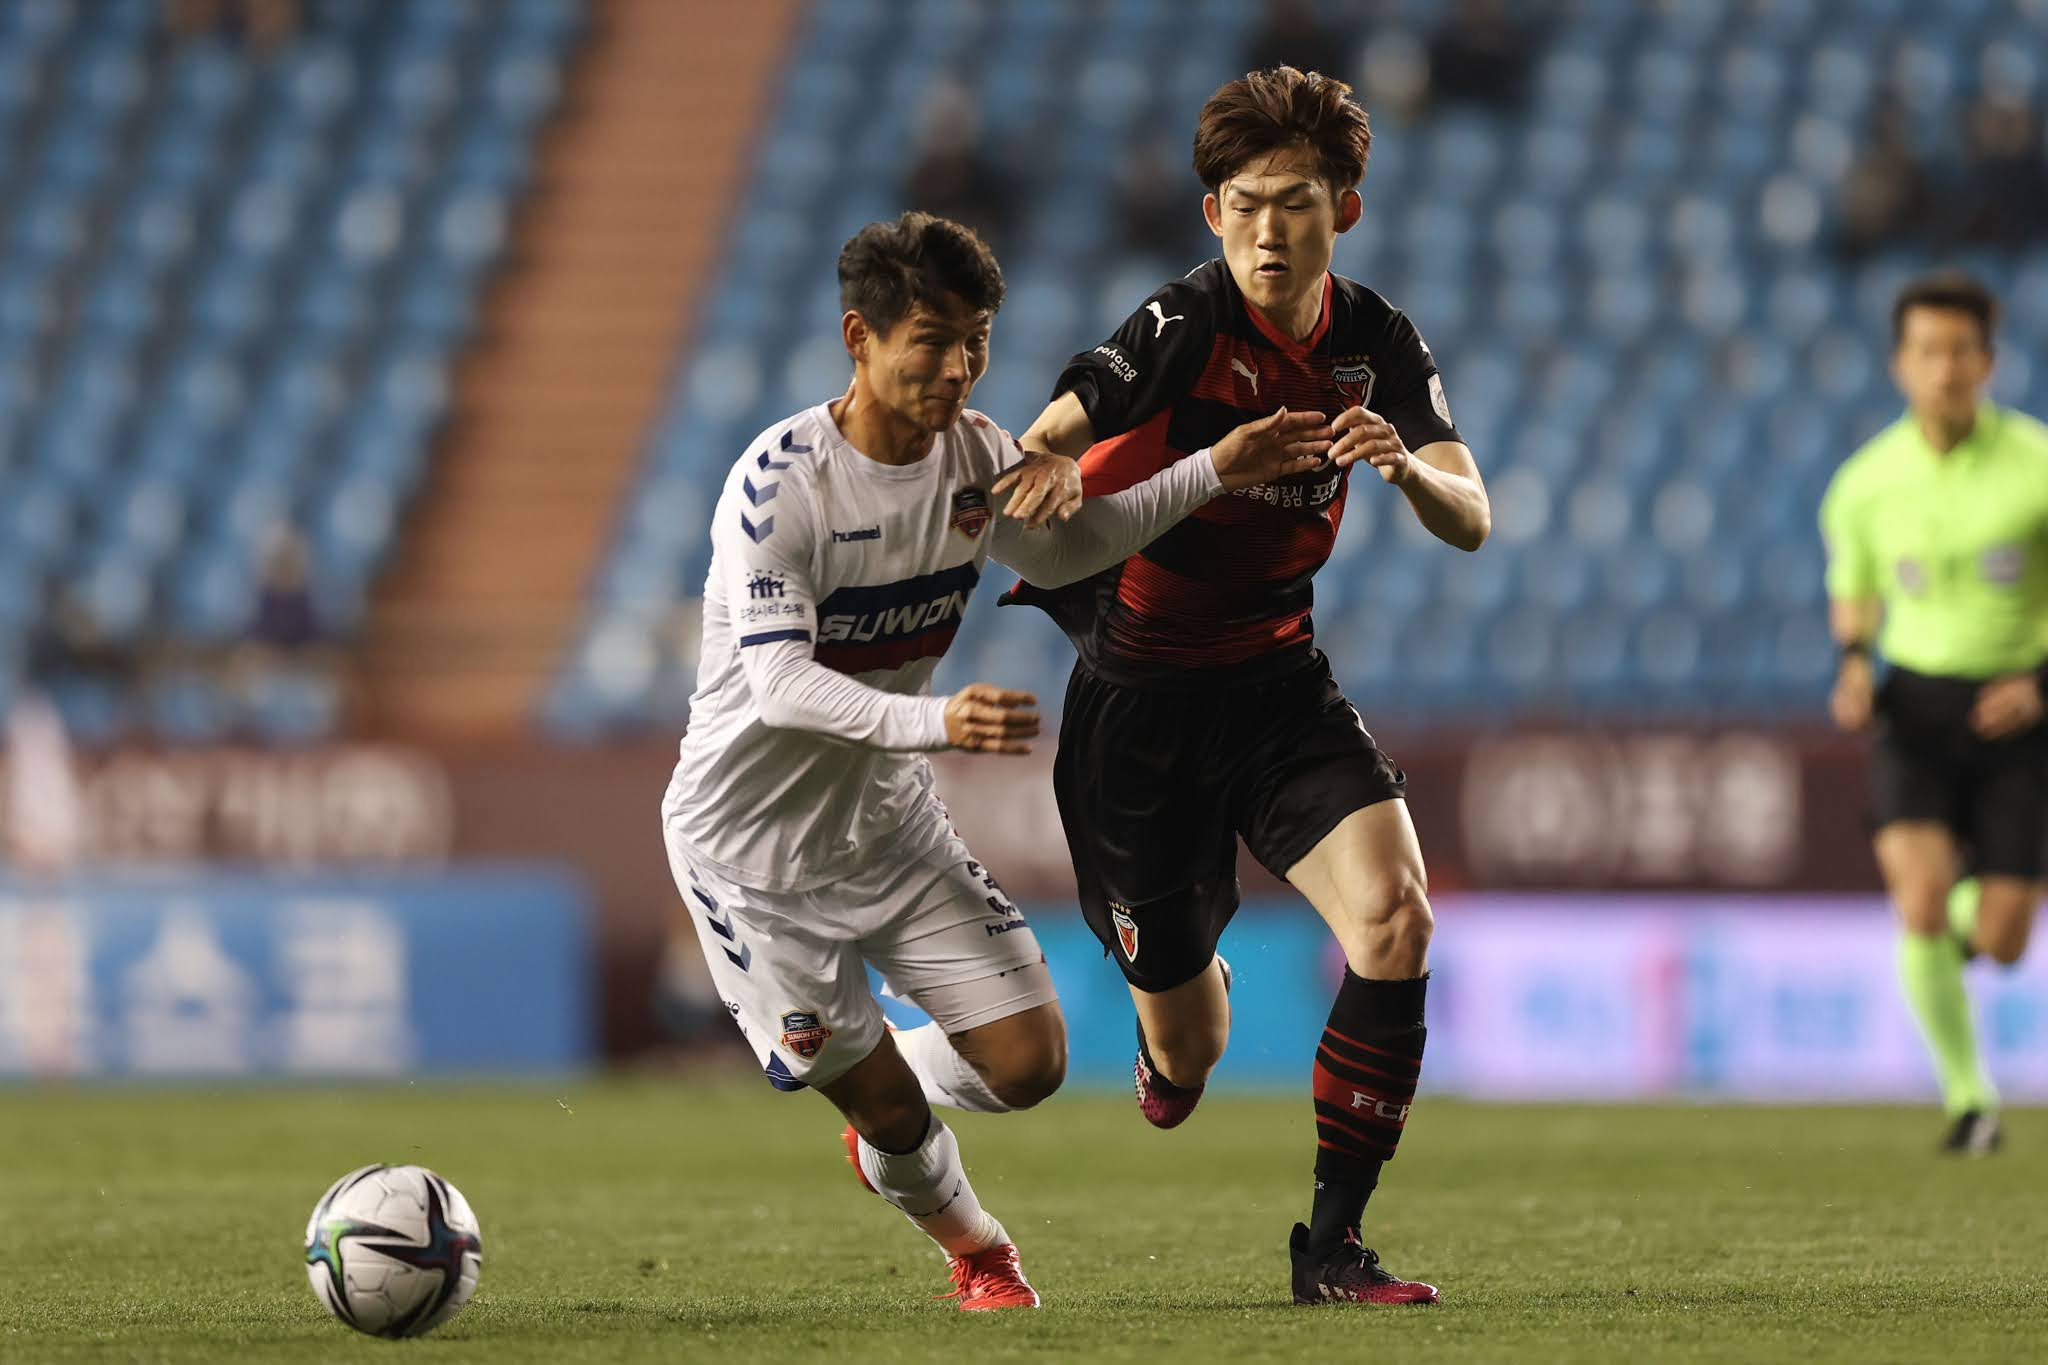 Suwon FC vs Pohang Steelers